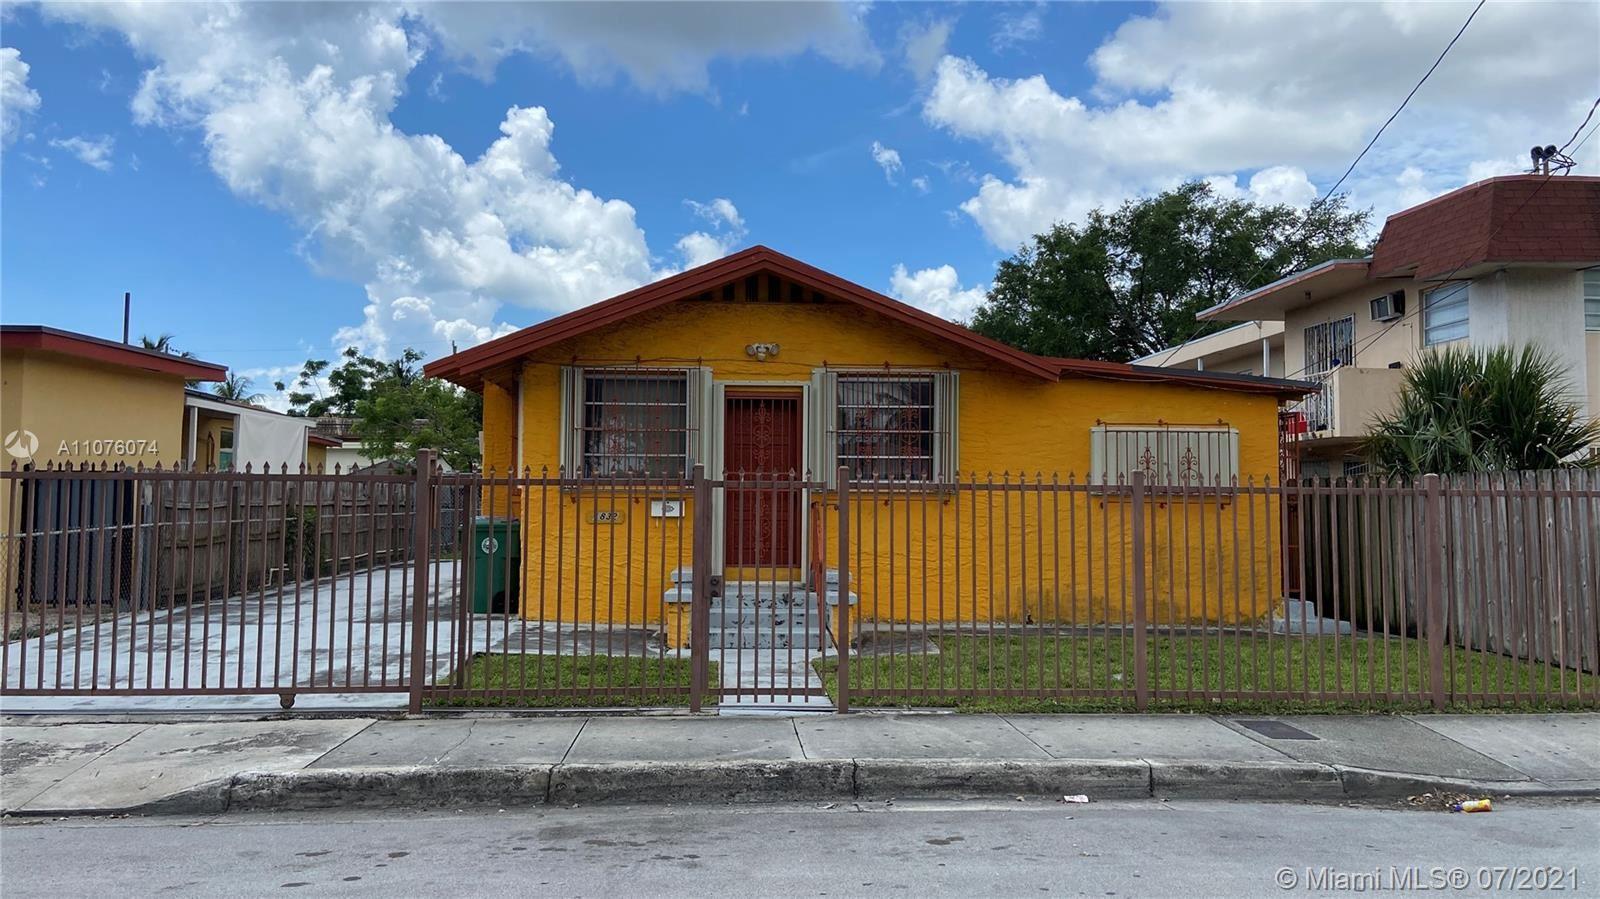 1832 SW 3rd St, Miami, FL 33135 - #: A11076074